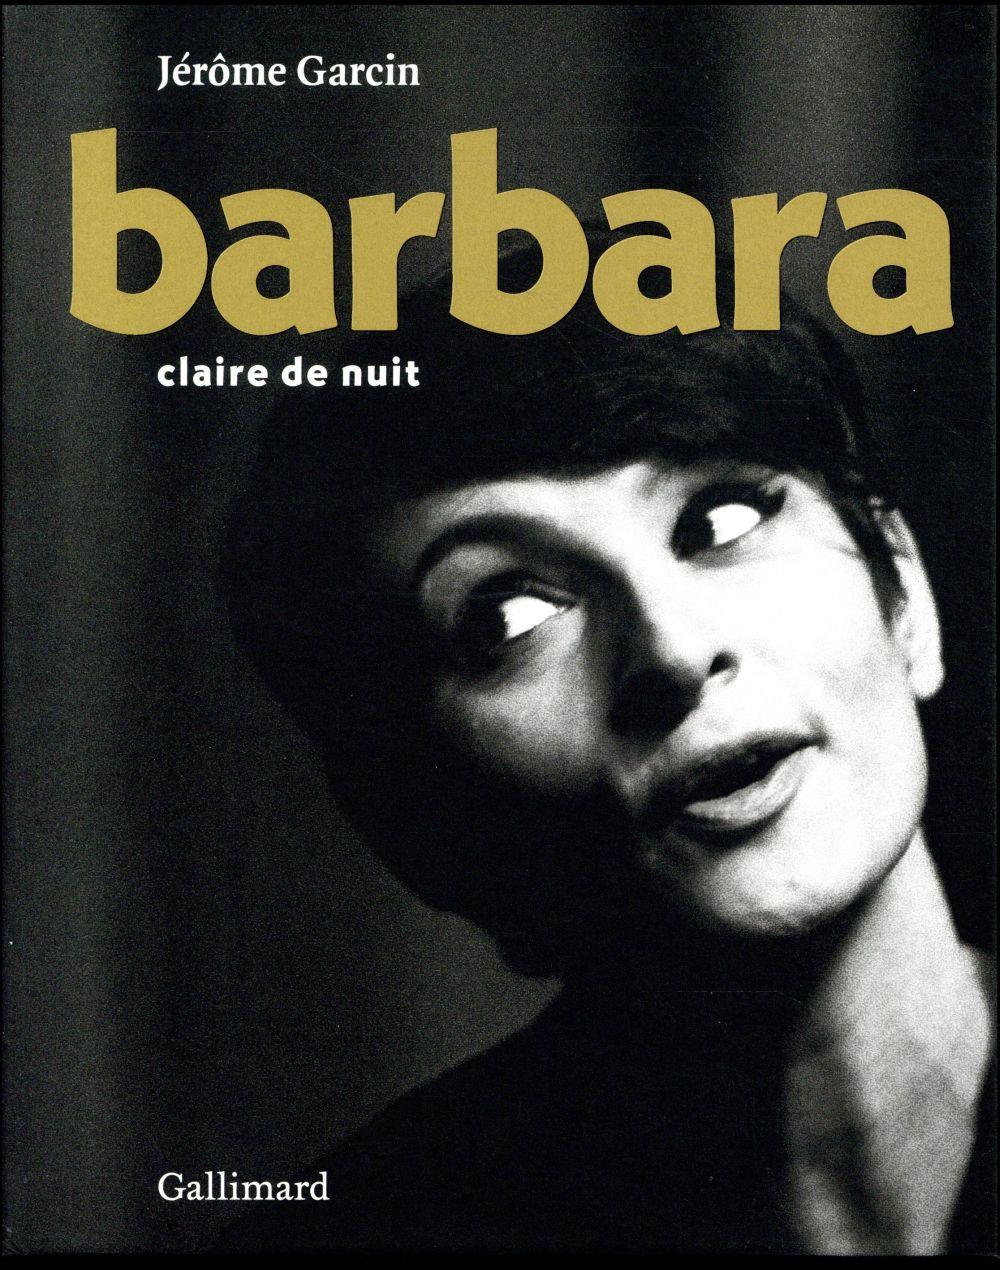 BARBARA, CLAIRE DE NUIT (EDITI